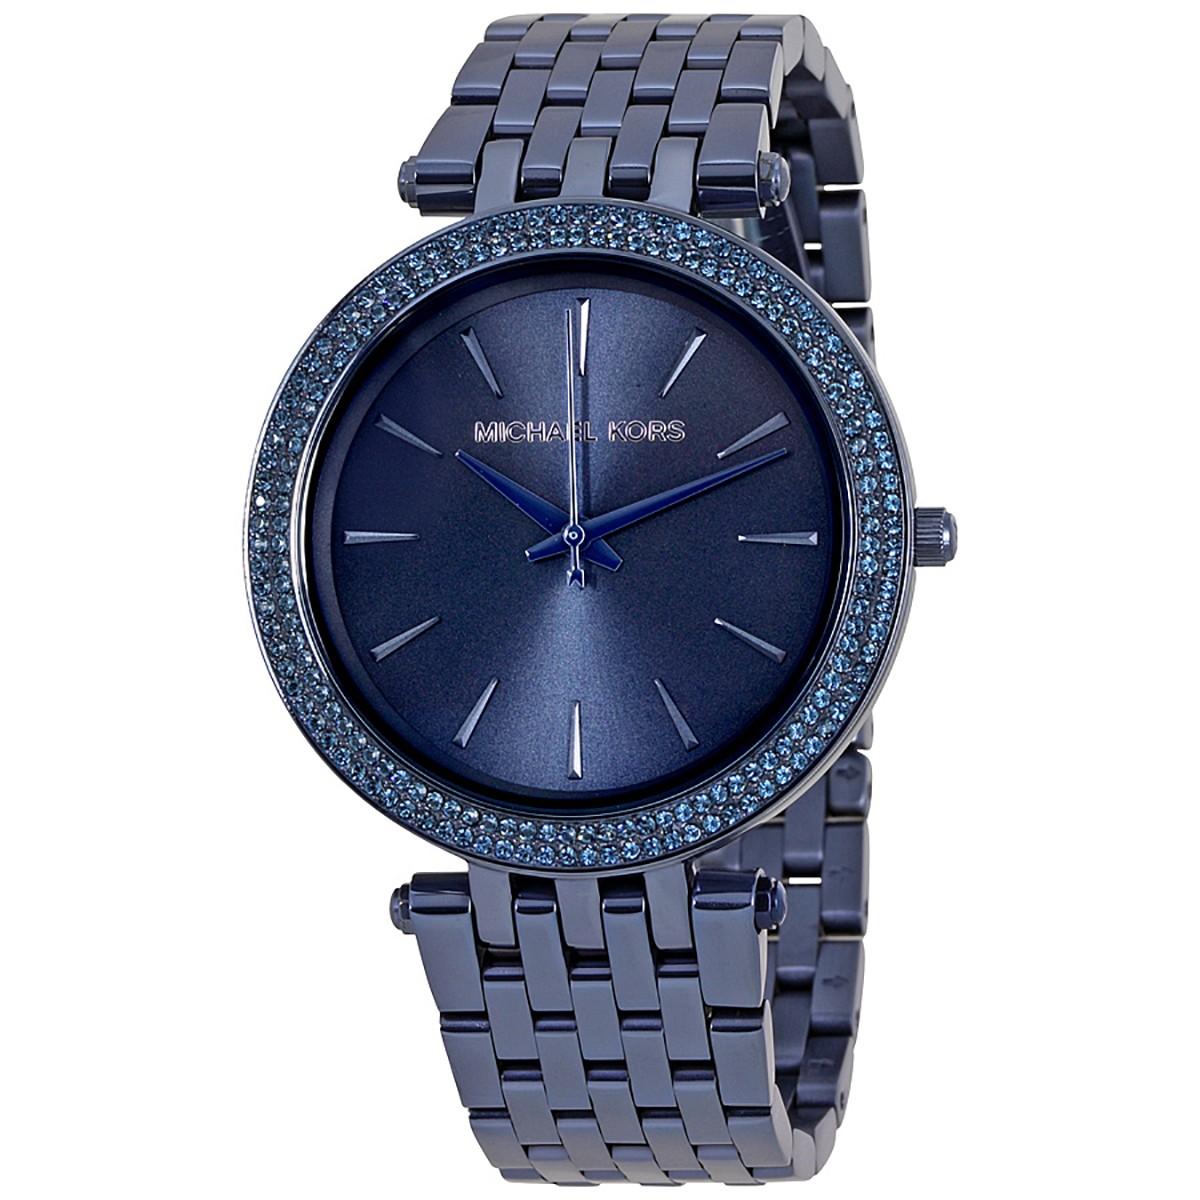 7203d4a9c6400 Compre Relógio Michael Kors Darci em 10X   Tri-Jóia Shop